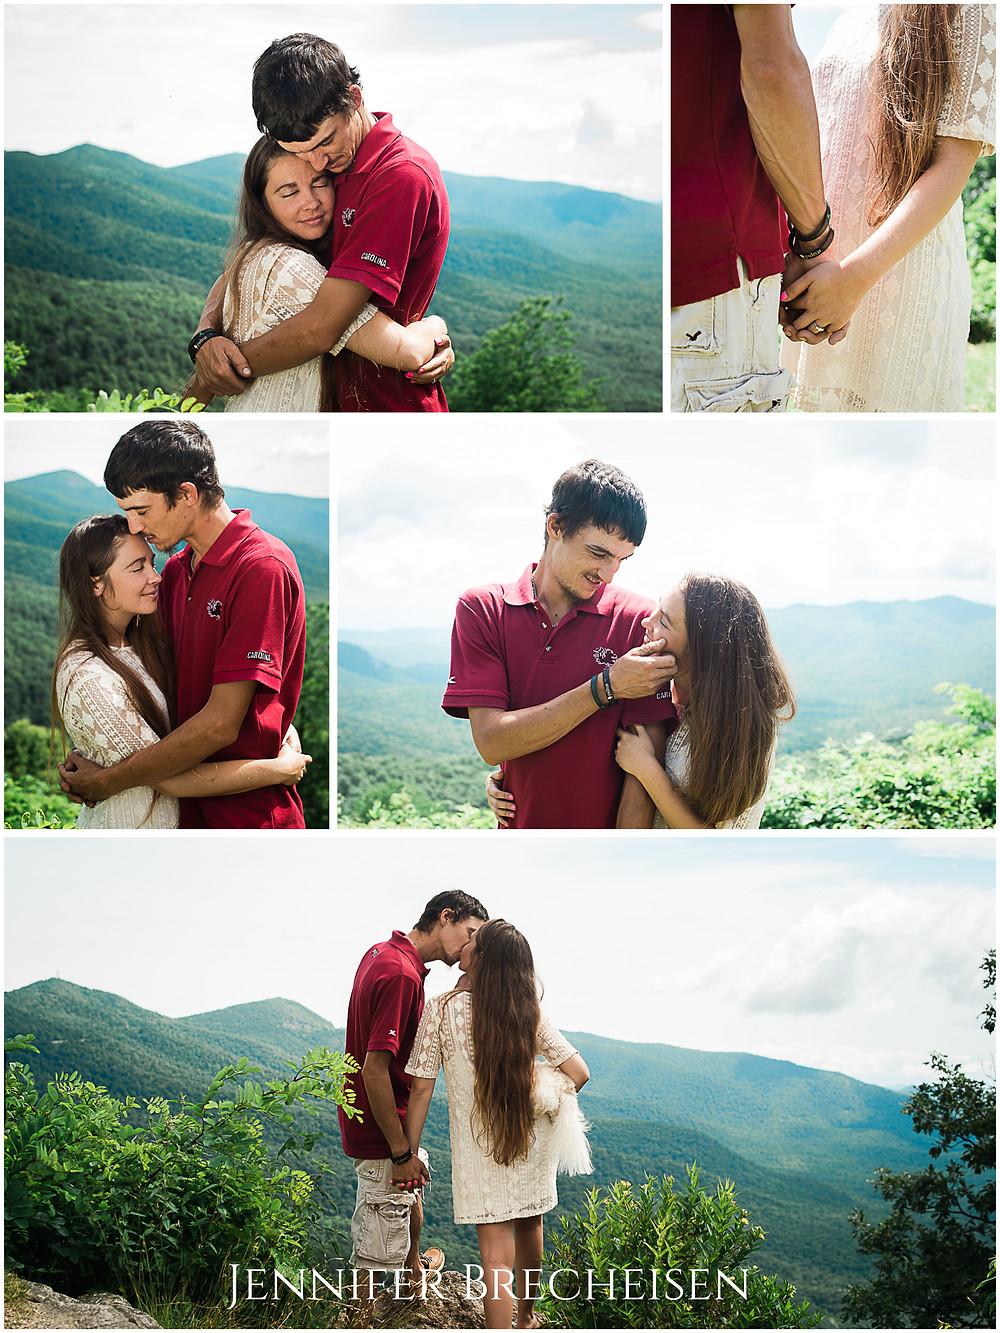 Blue Ridge Parkway Asheville aspen Engagement Wedding Photographer Photography Fine Art Adventure Destination mountain